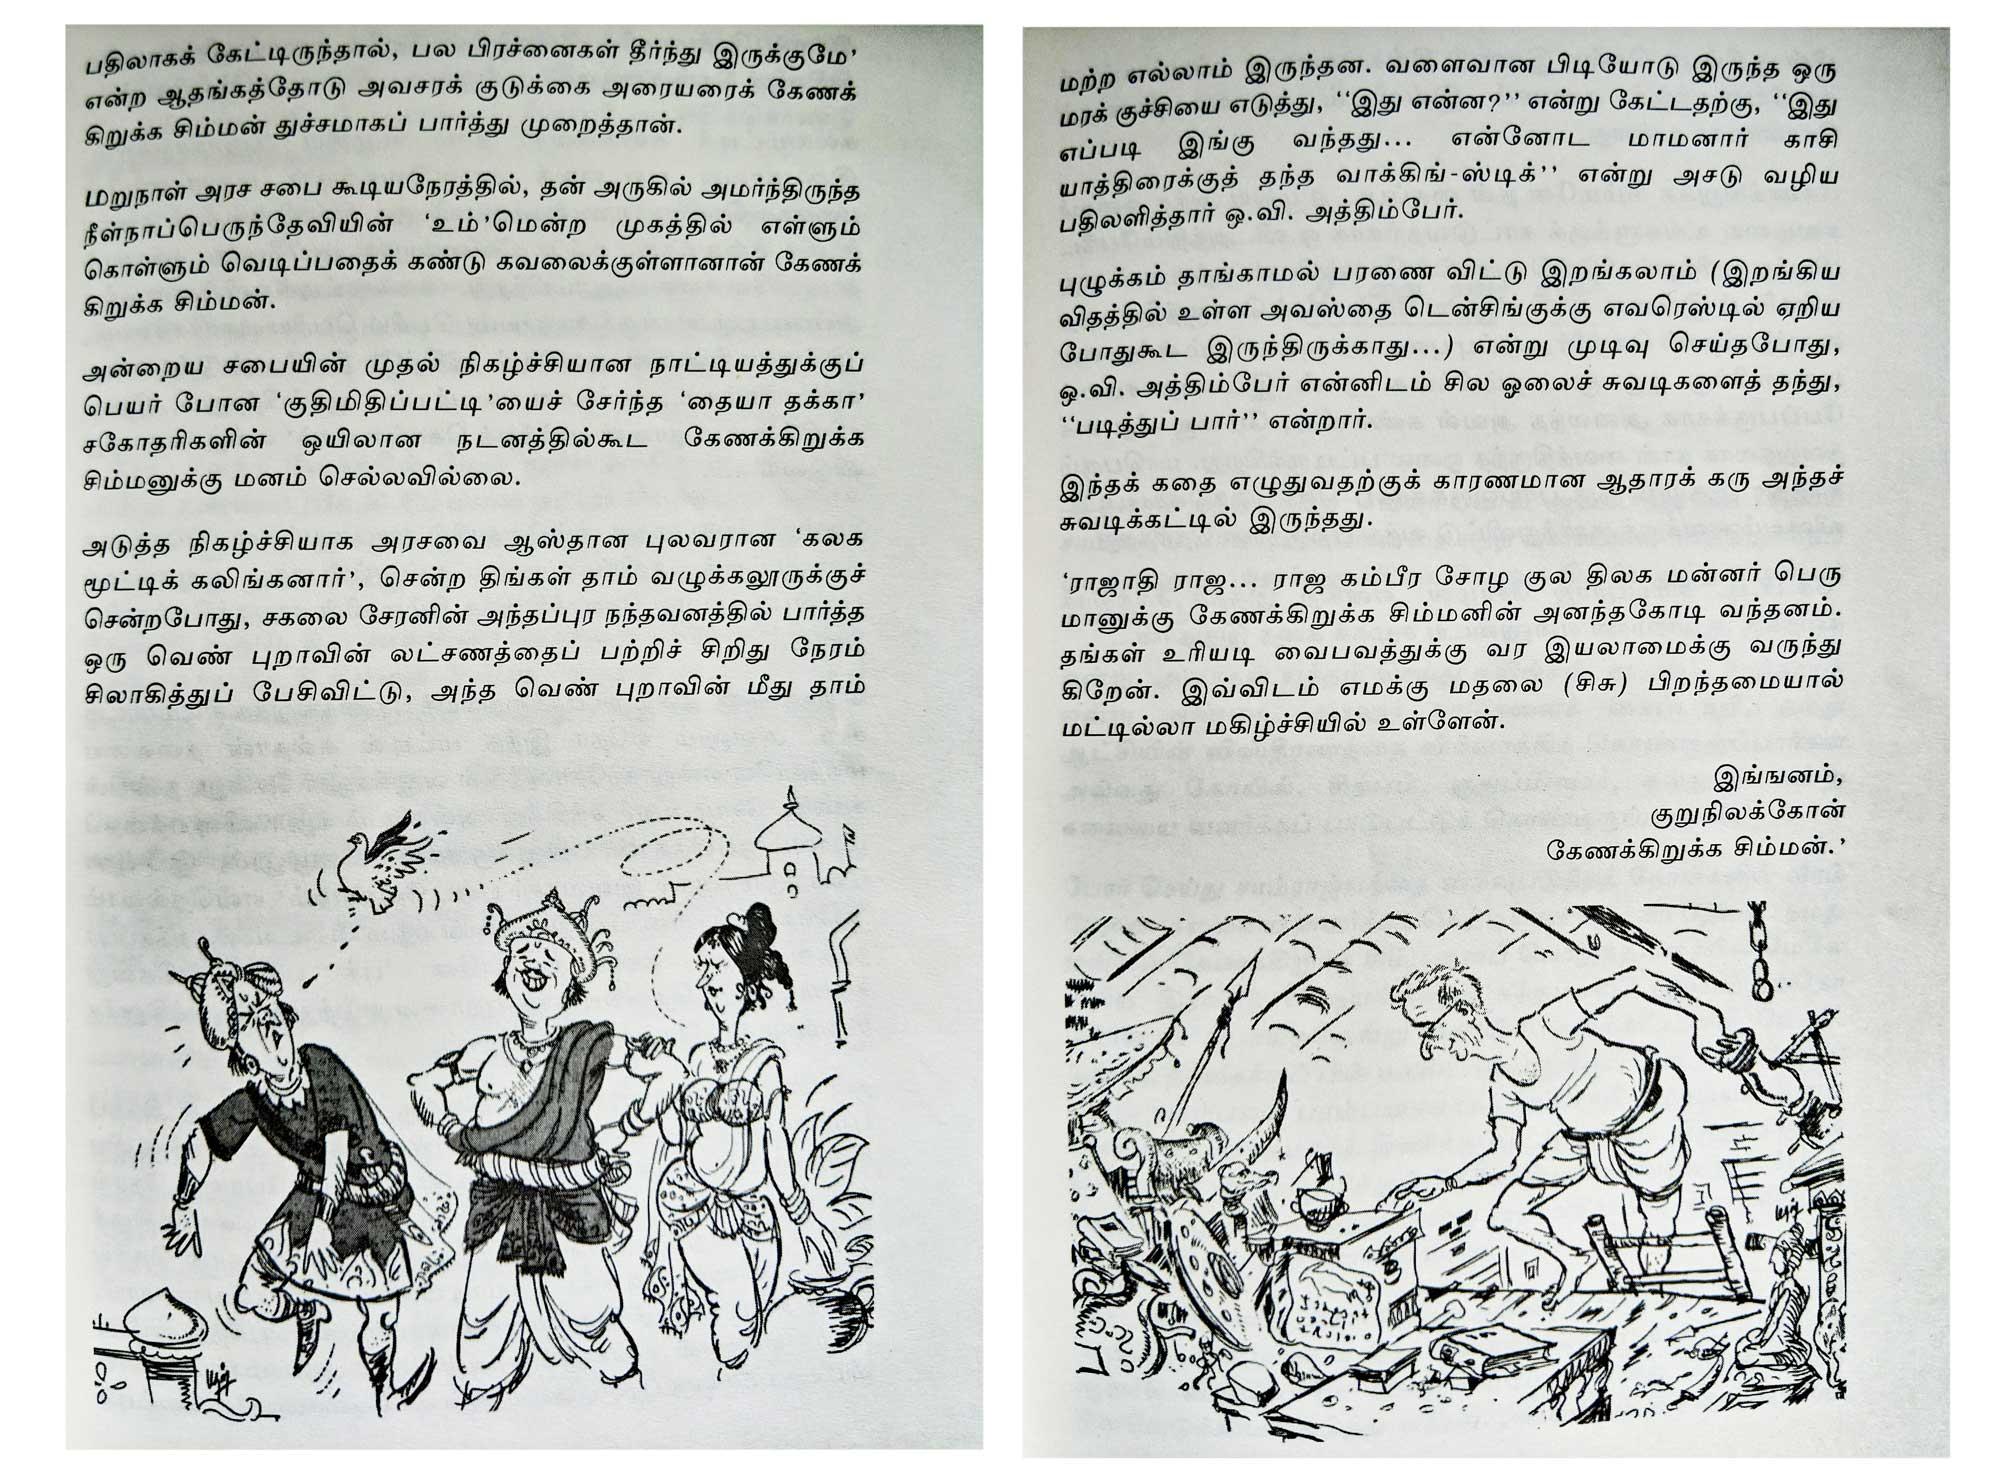 Inside pages of KPD Sirripuraja Chozhan by Crazy Mohan (கே.பி.டி. சிரிப்புராஜ சோழன், கிரேசி மோகன்). Courtesy: NHM, கிழக்கு பதிப்பகம்.